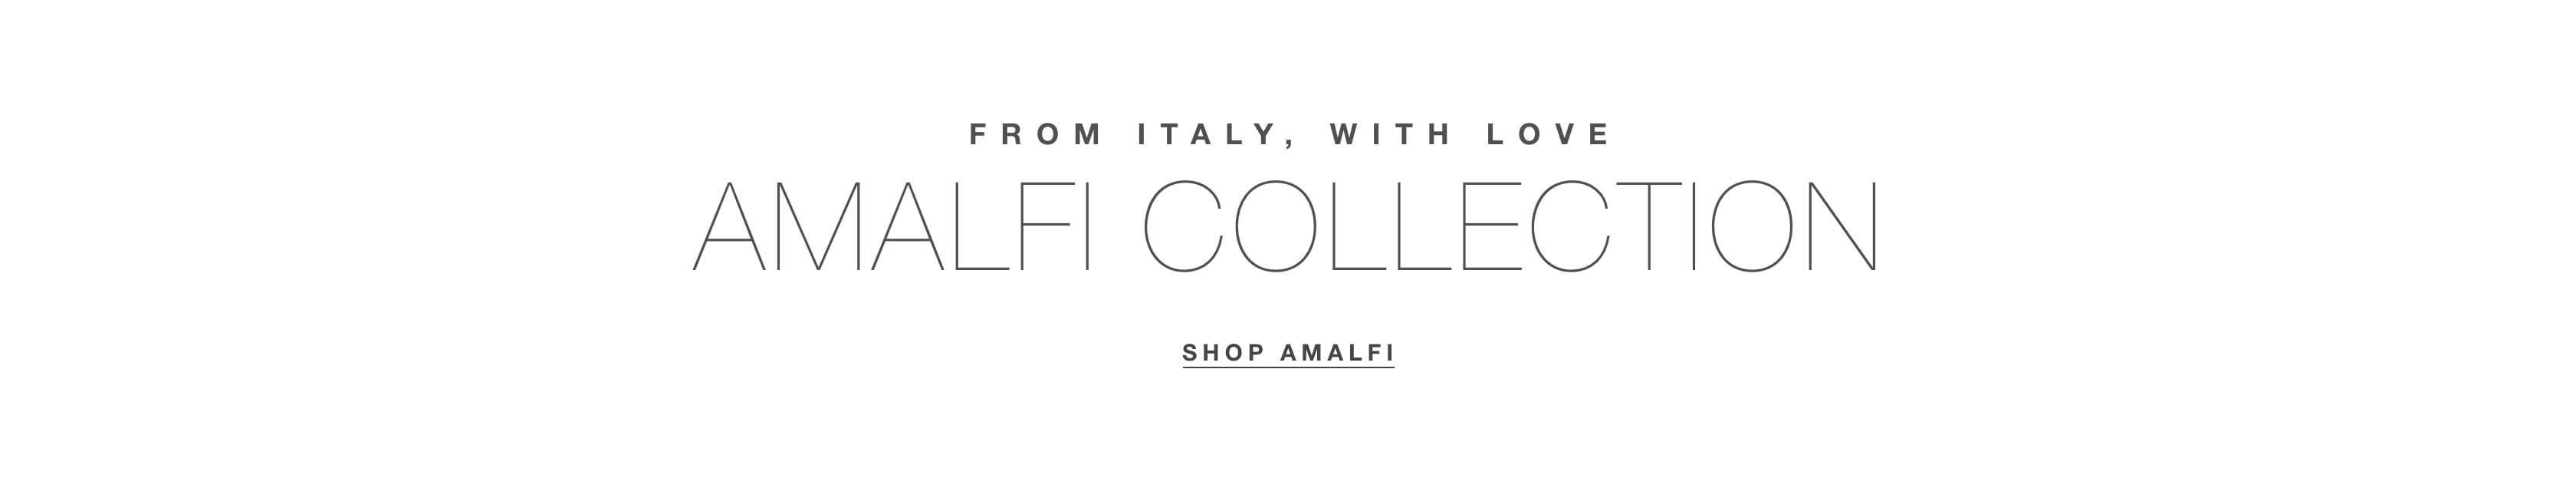 Shop the Amalfi Collection